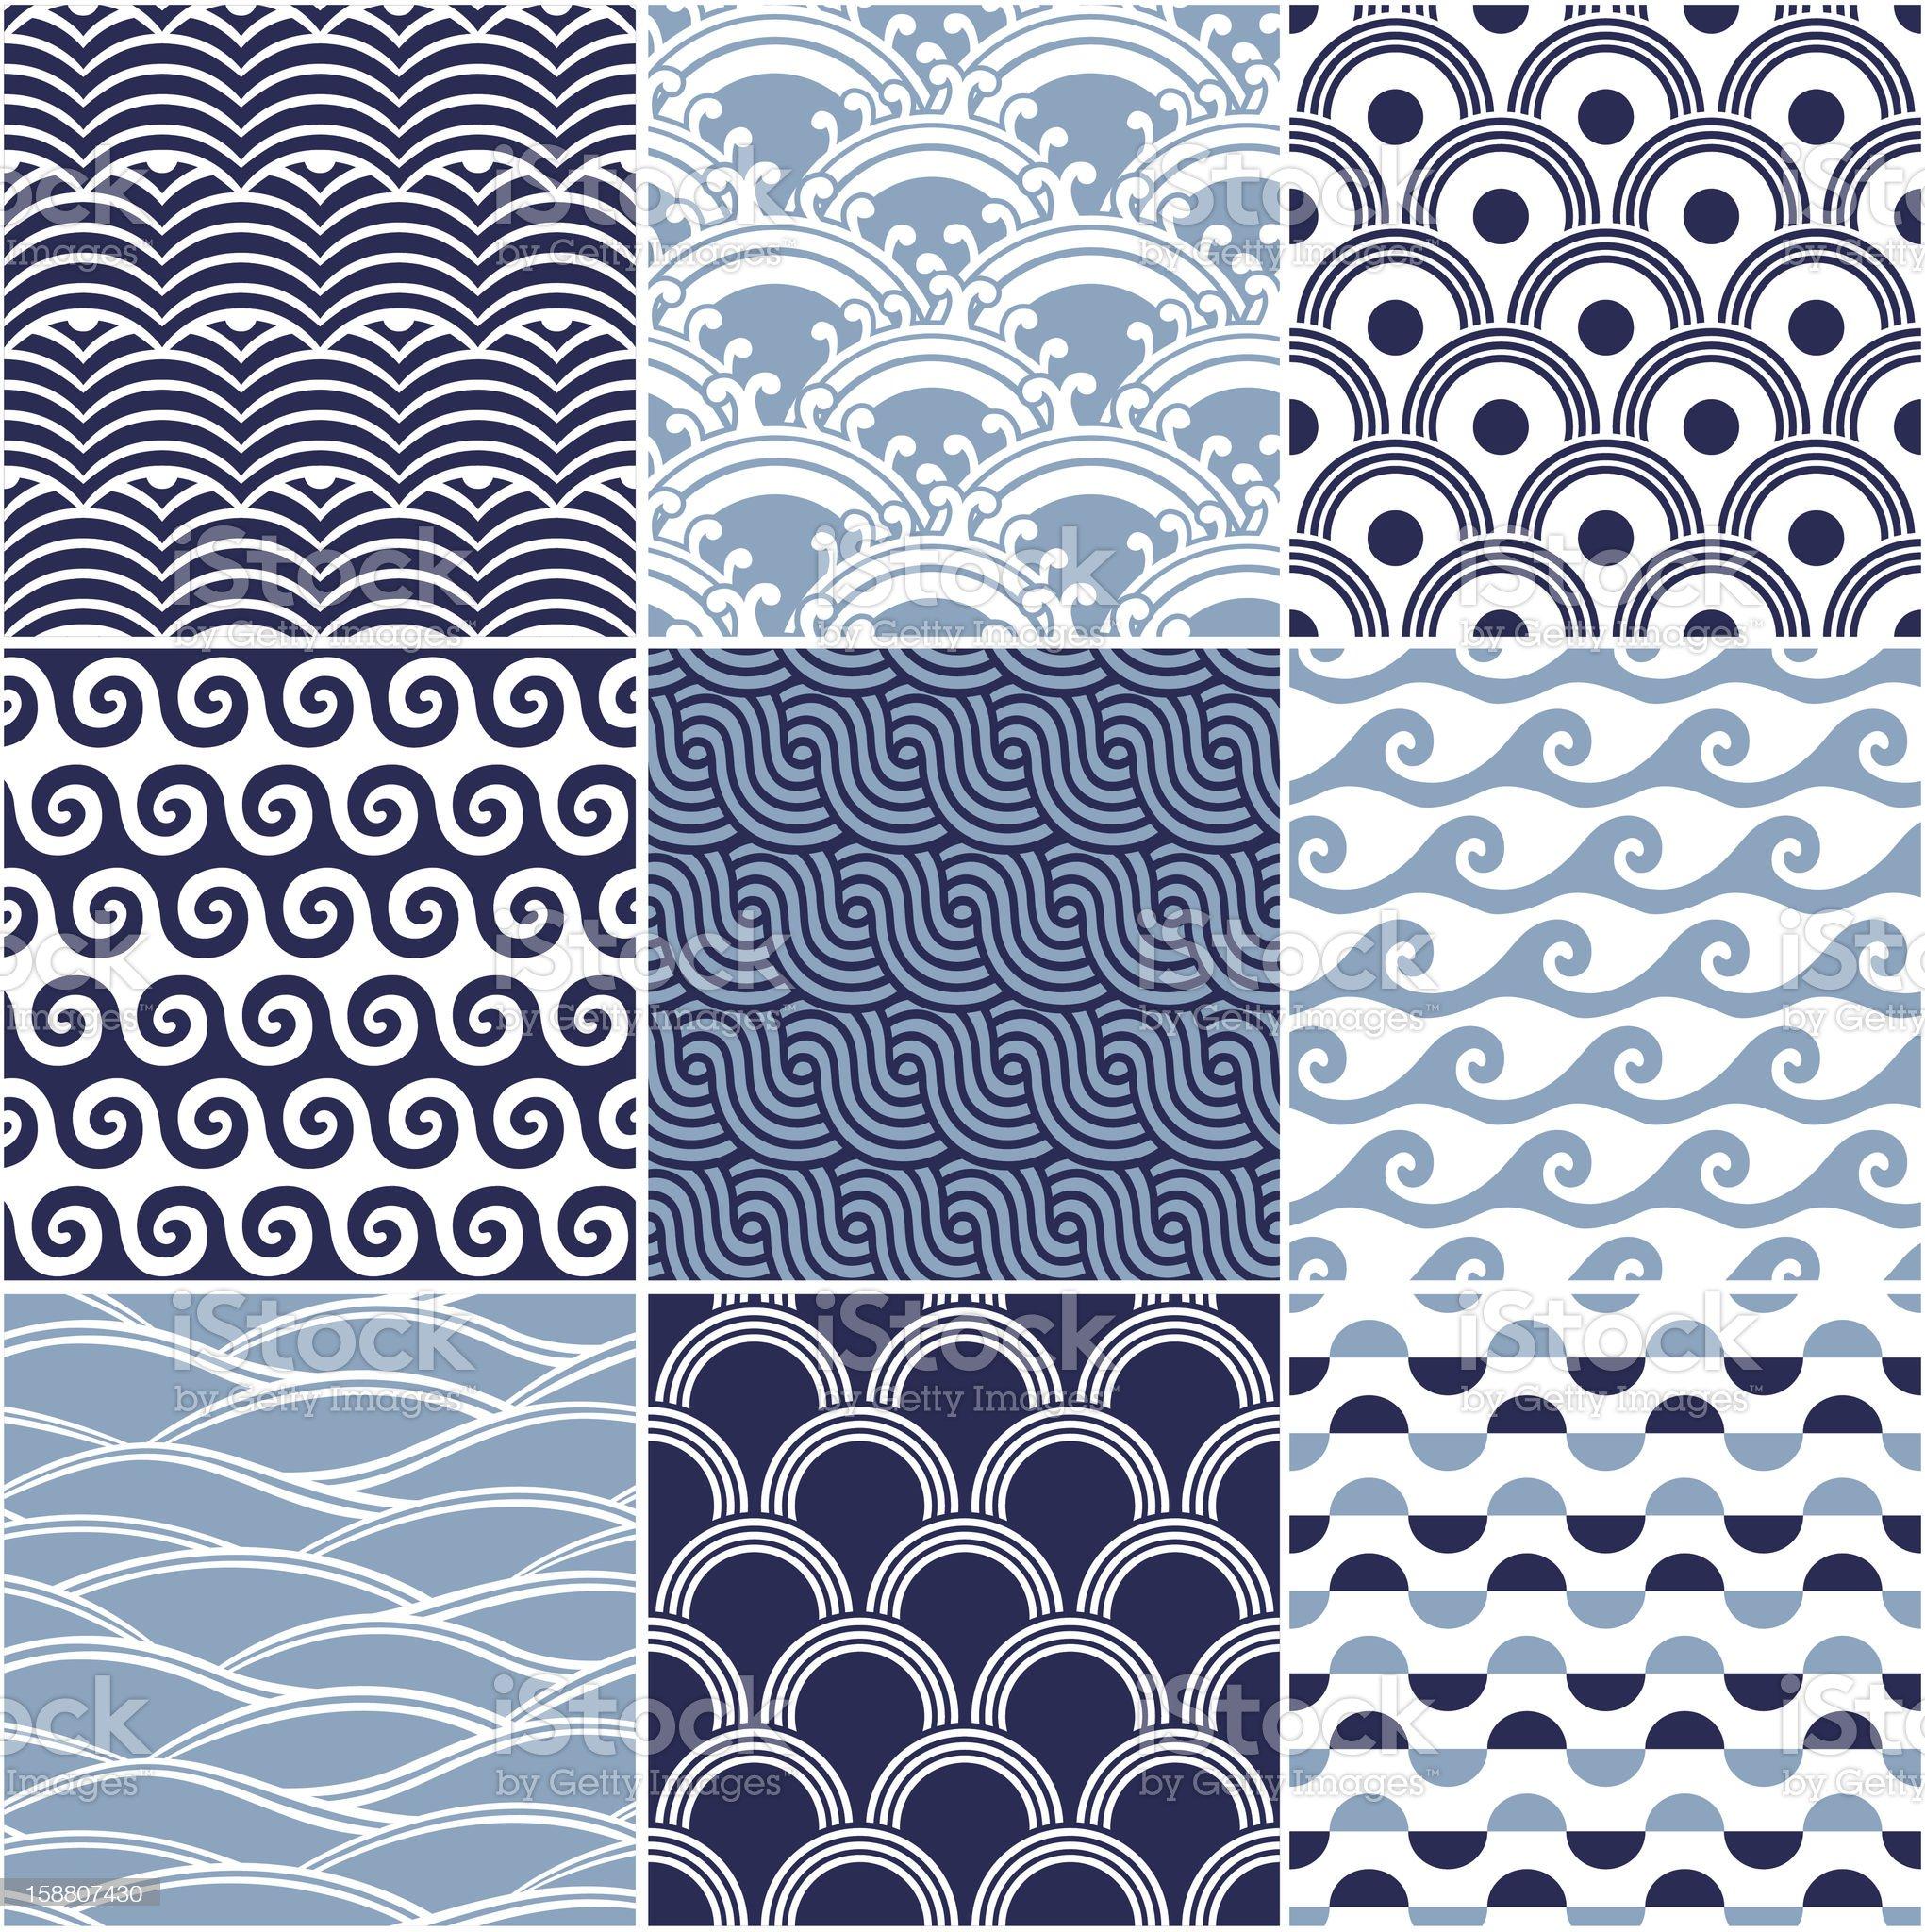 seamless ocean wave pattern royalty-free stock photo